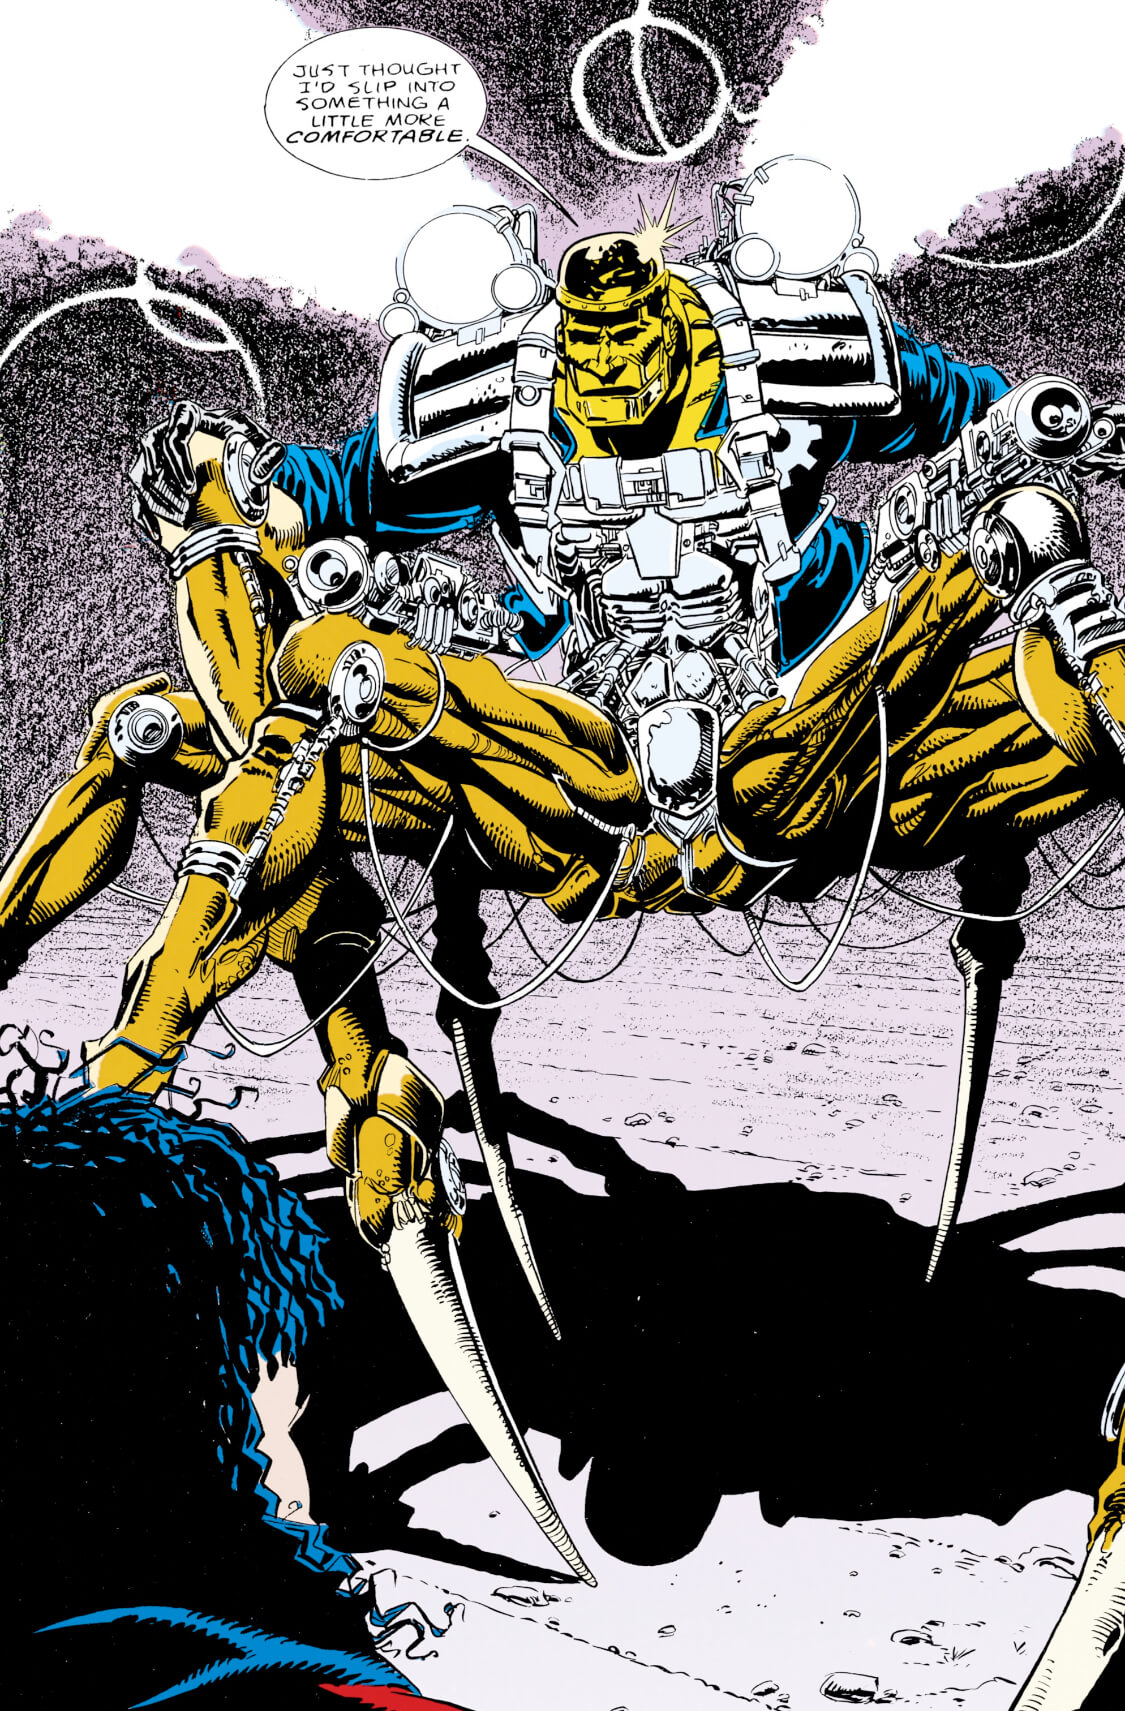 Robotman-Spider-Legs-Doom-Patrol.jpg